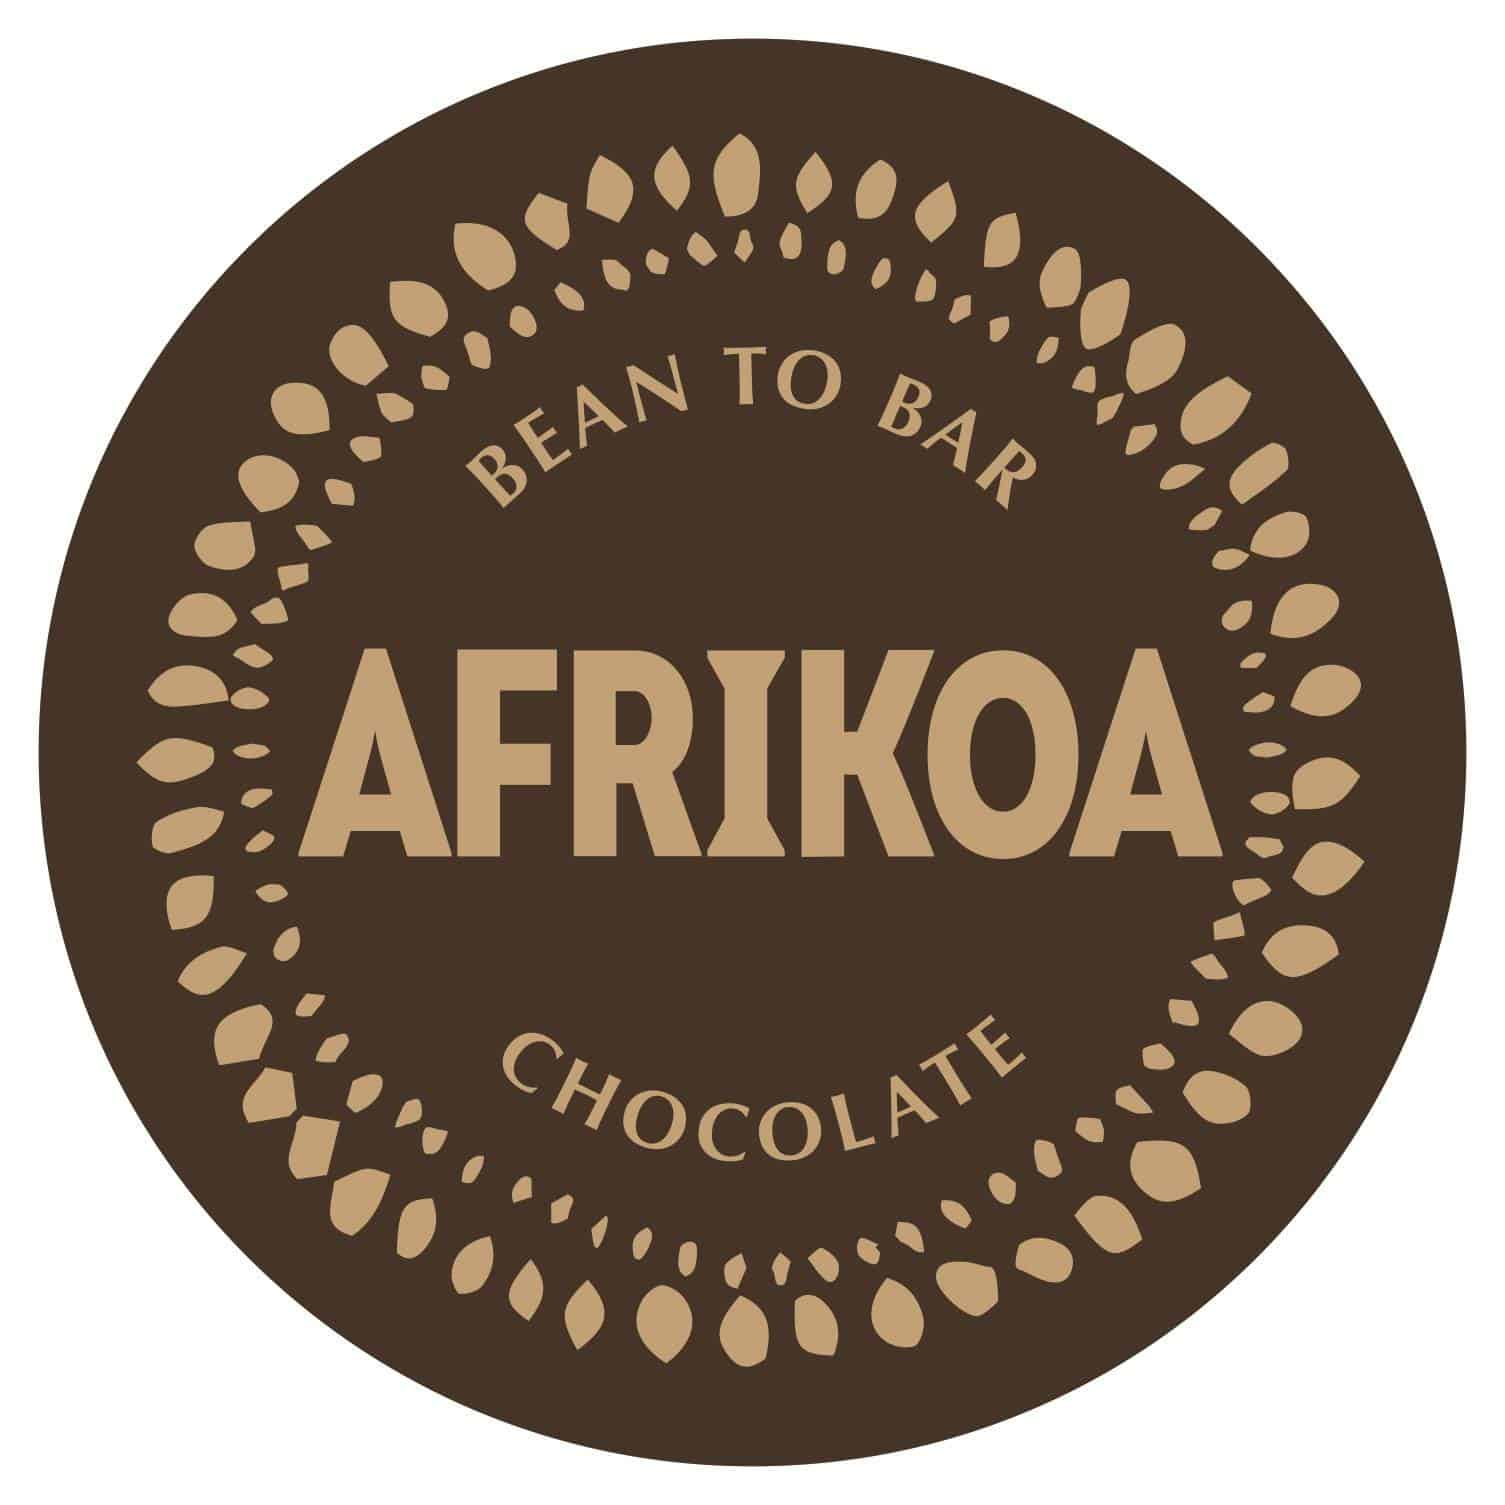 Afrikoa Chocolate